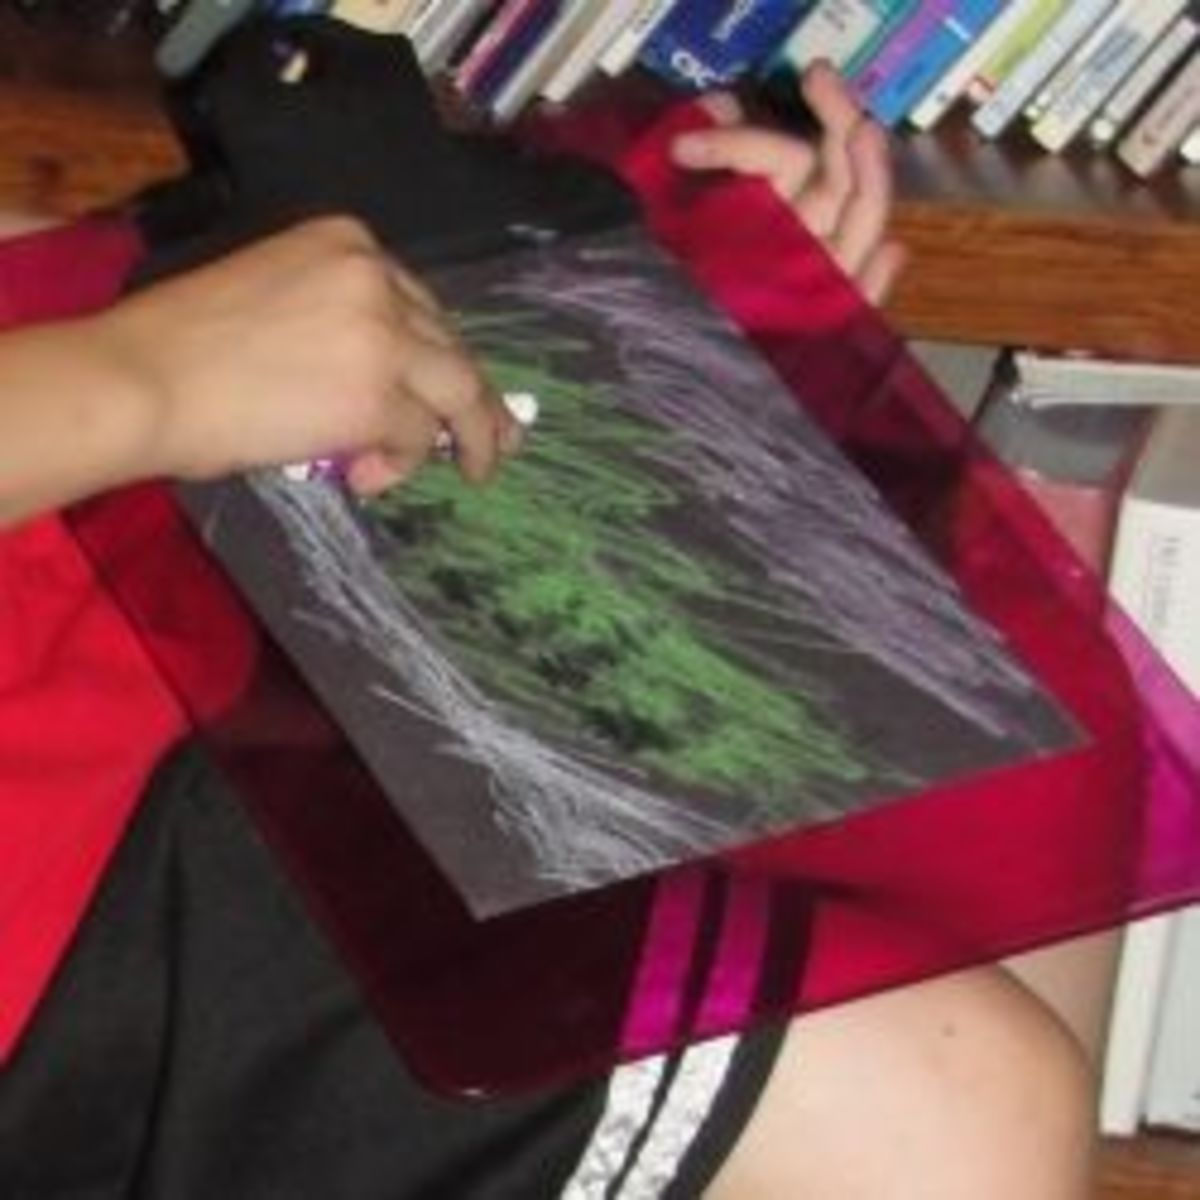 Sketching an Aurora Borealis landscape scene using pastels